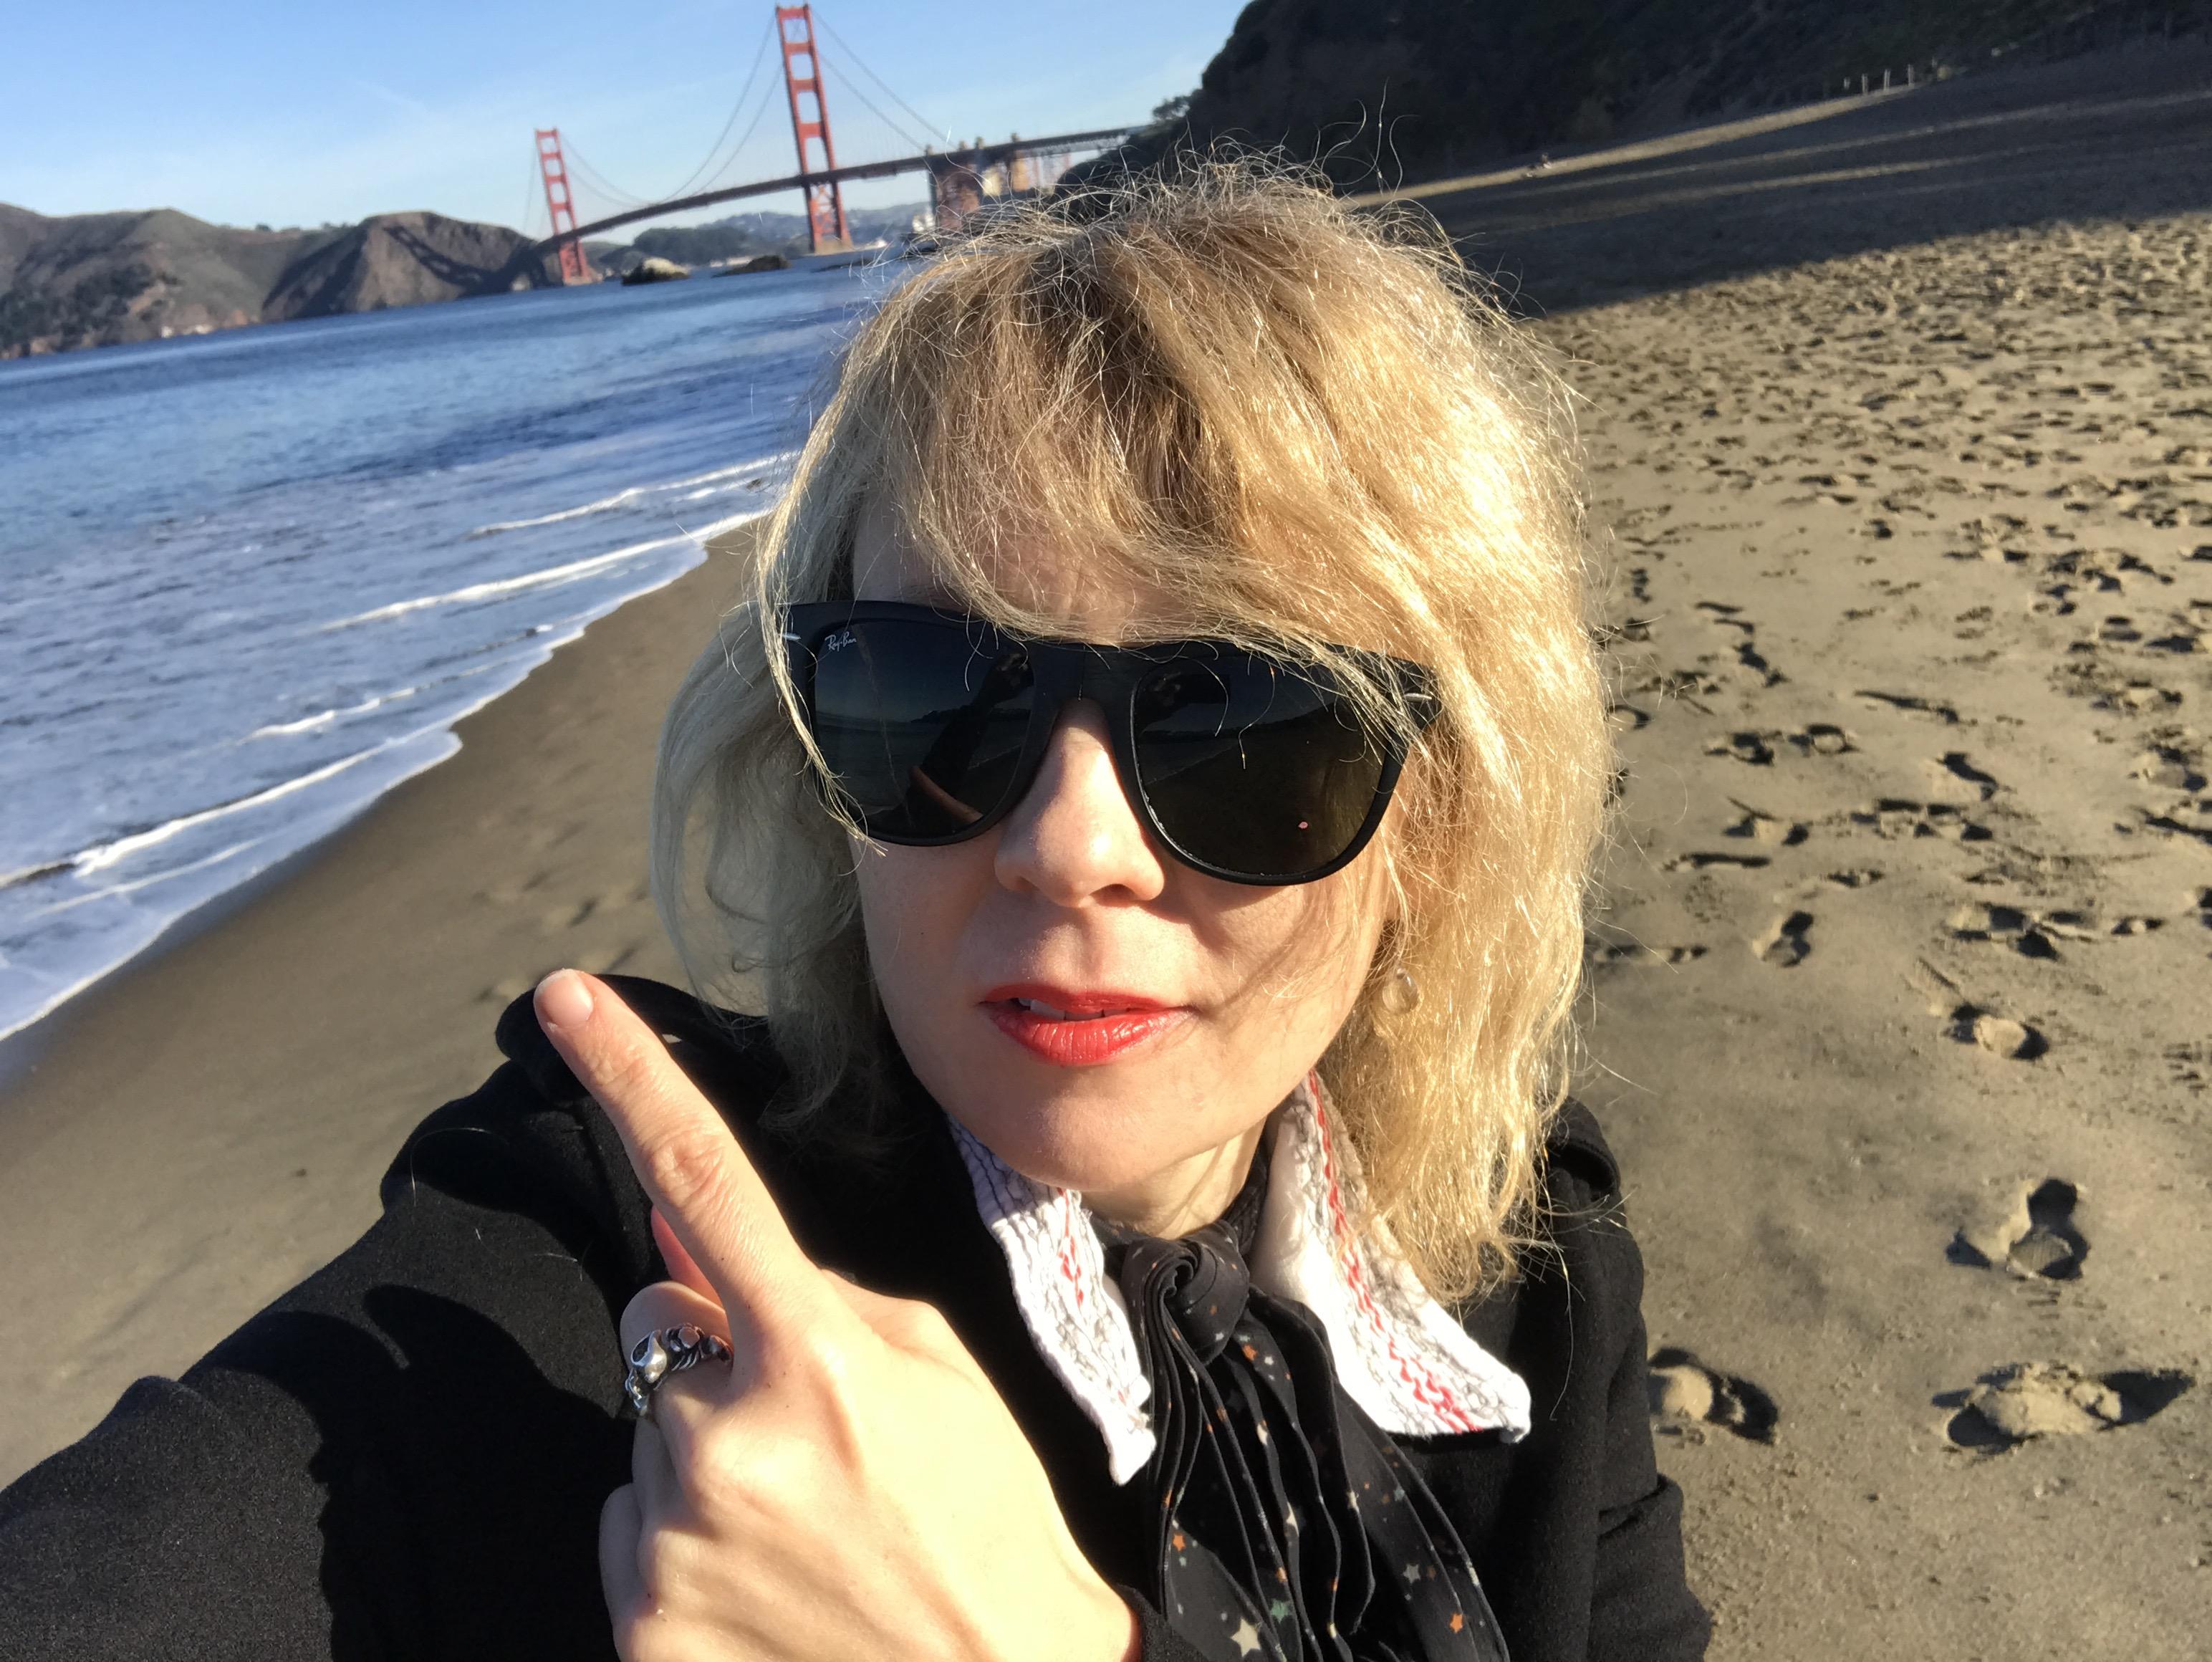 Lettie at dawn at Baker Beach, San Francisco February 2018